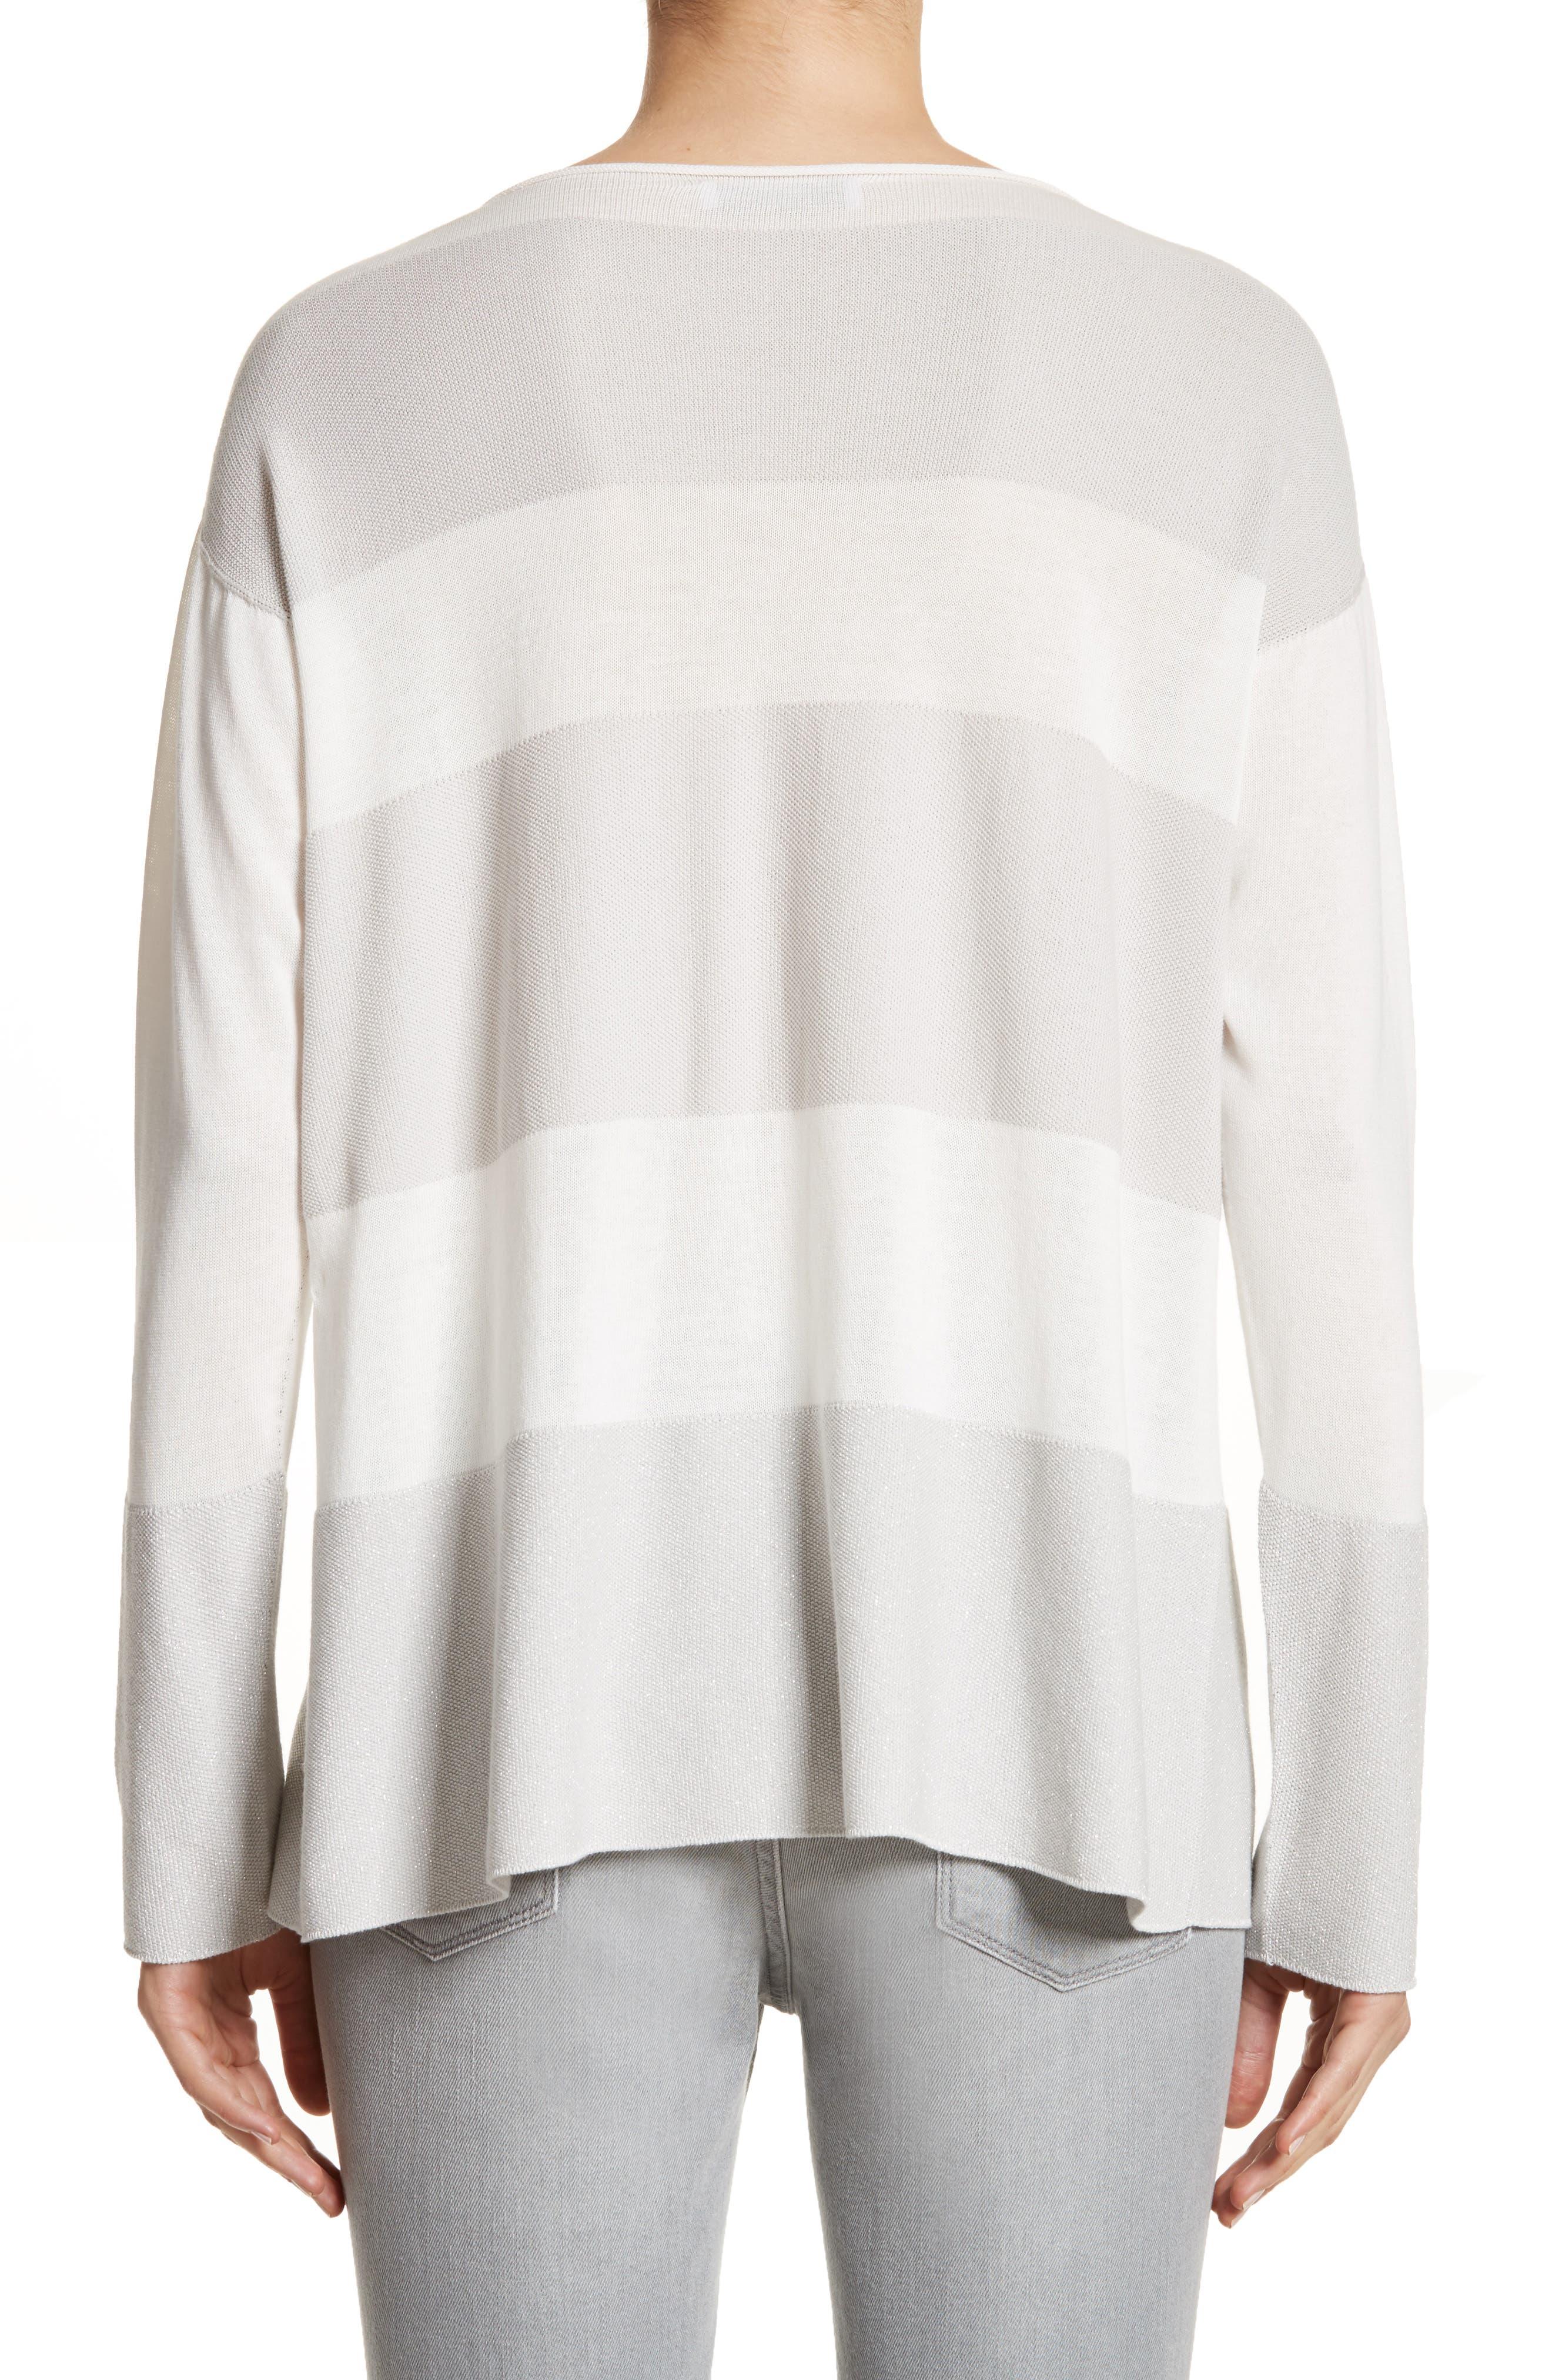 Popcorn Stripe Metallic Knit Sweater,                             Alternate thumbnail 2, color,                             020